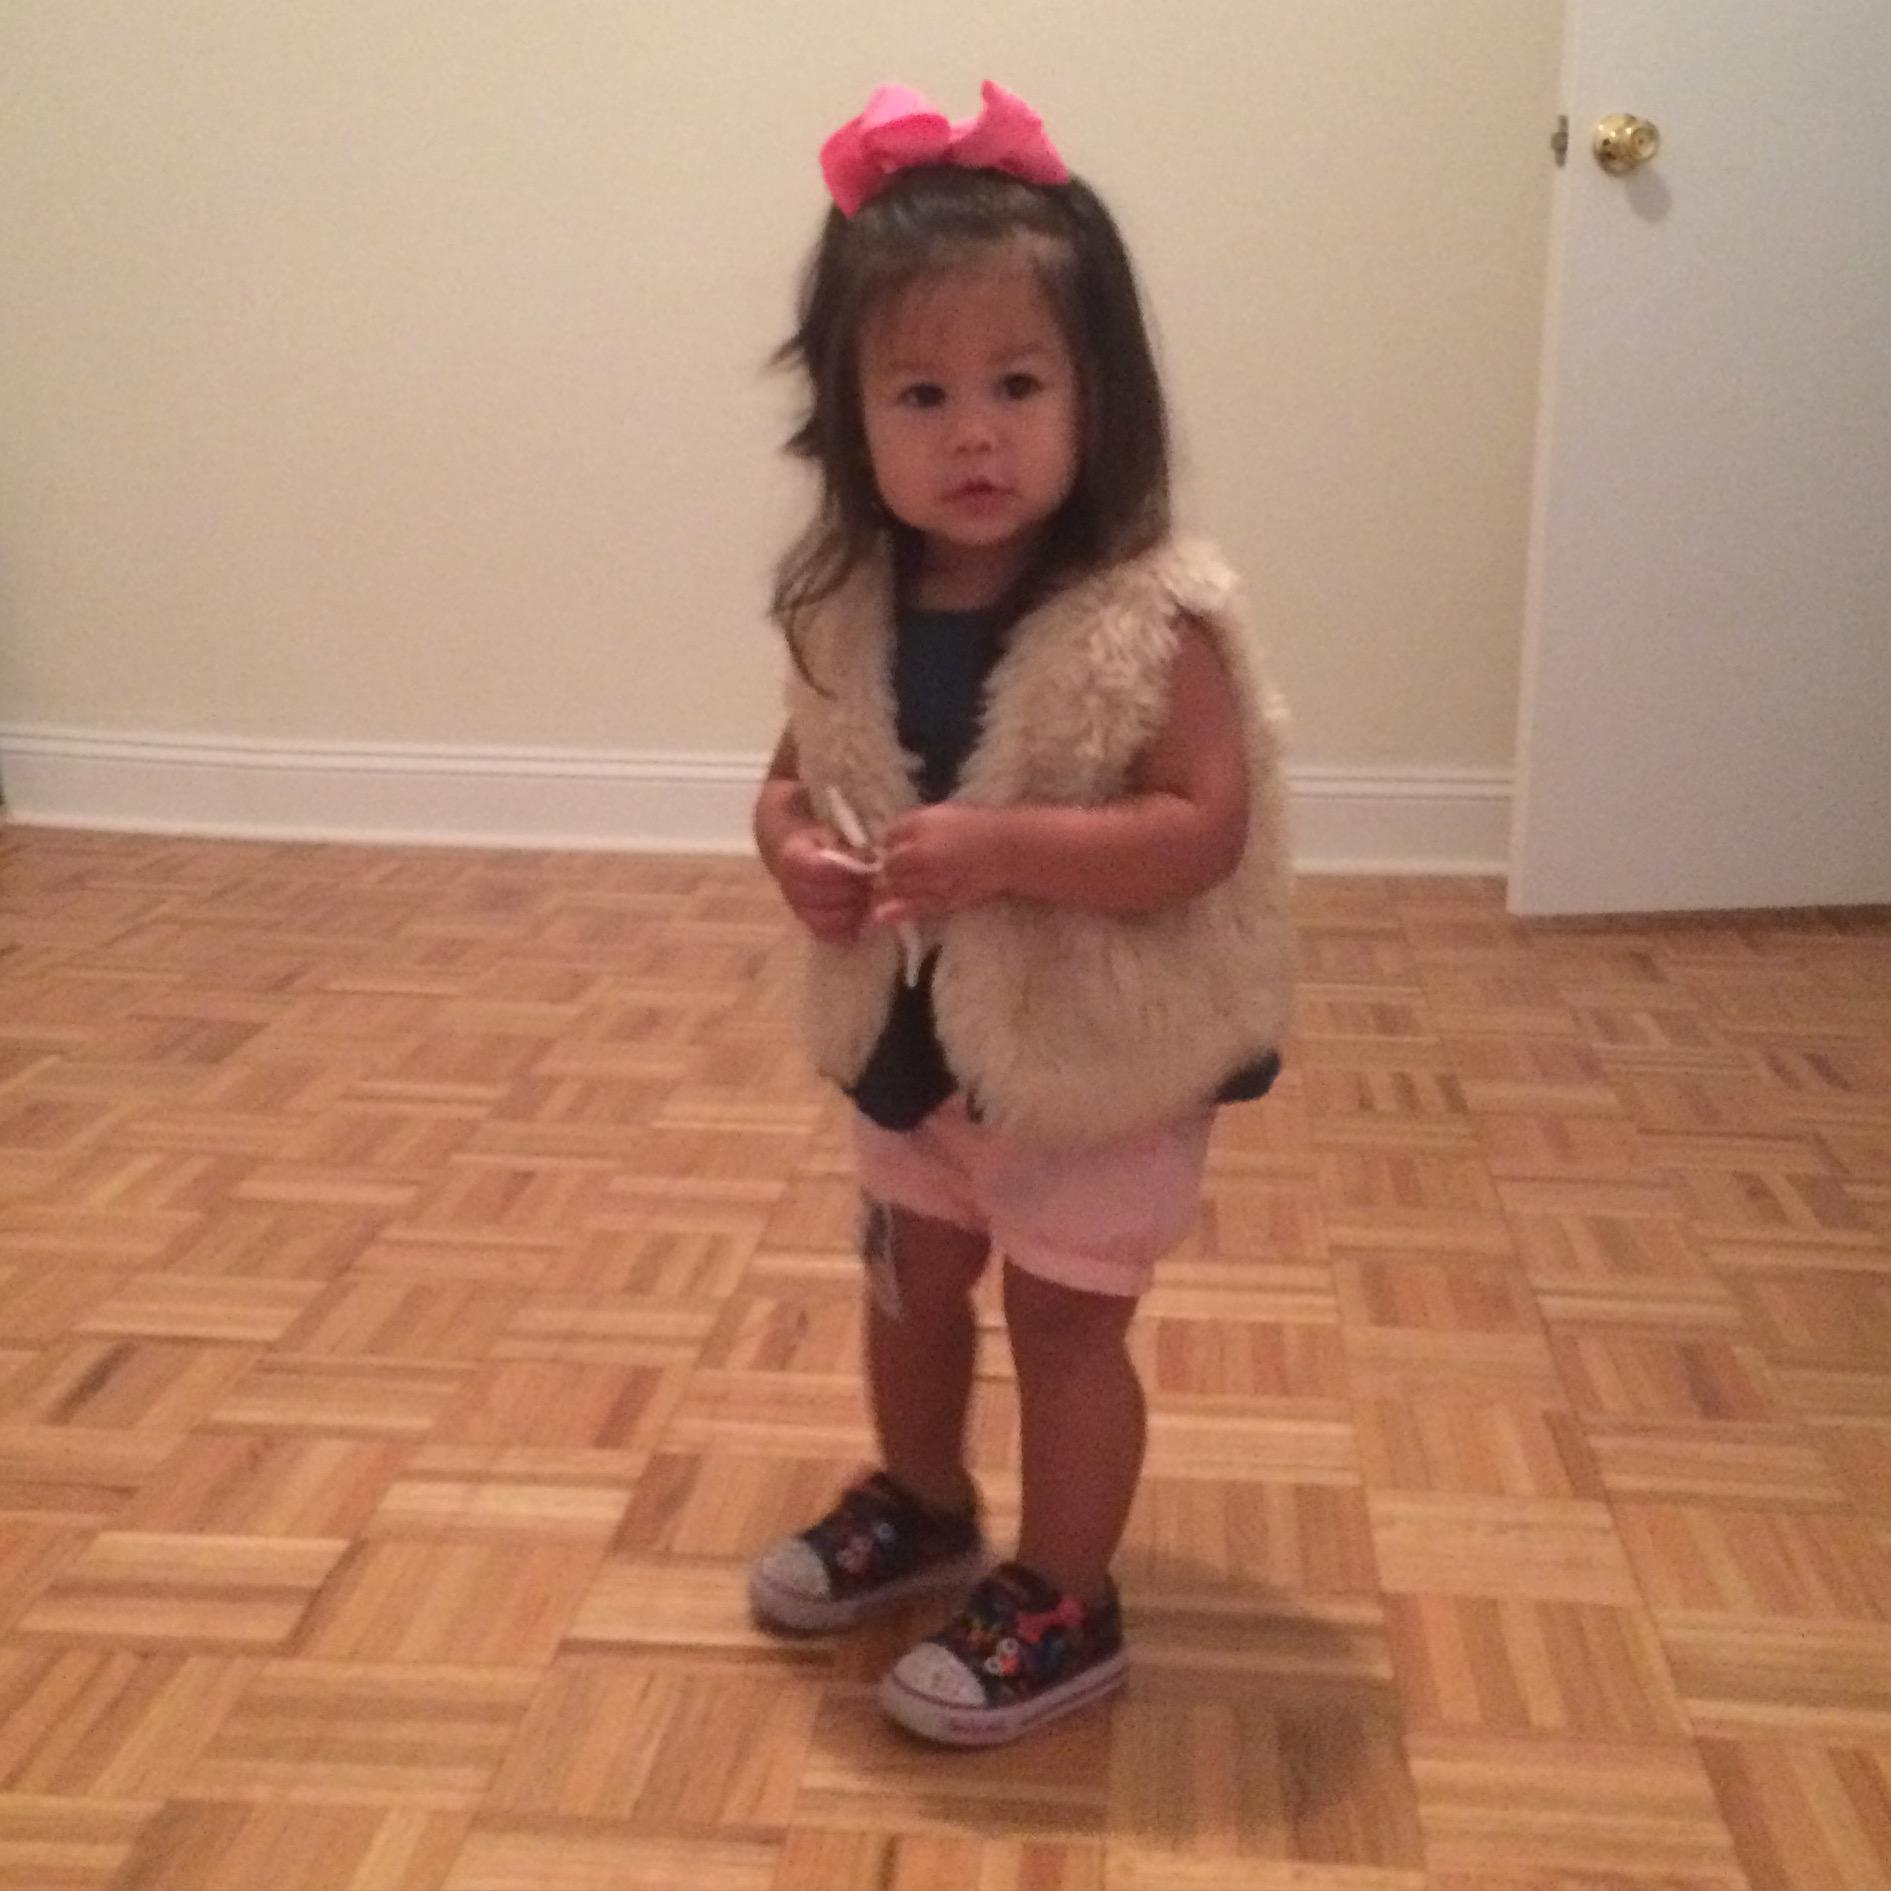 She's got style